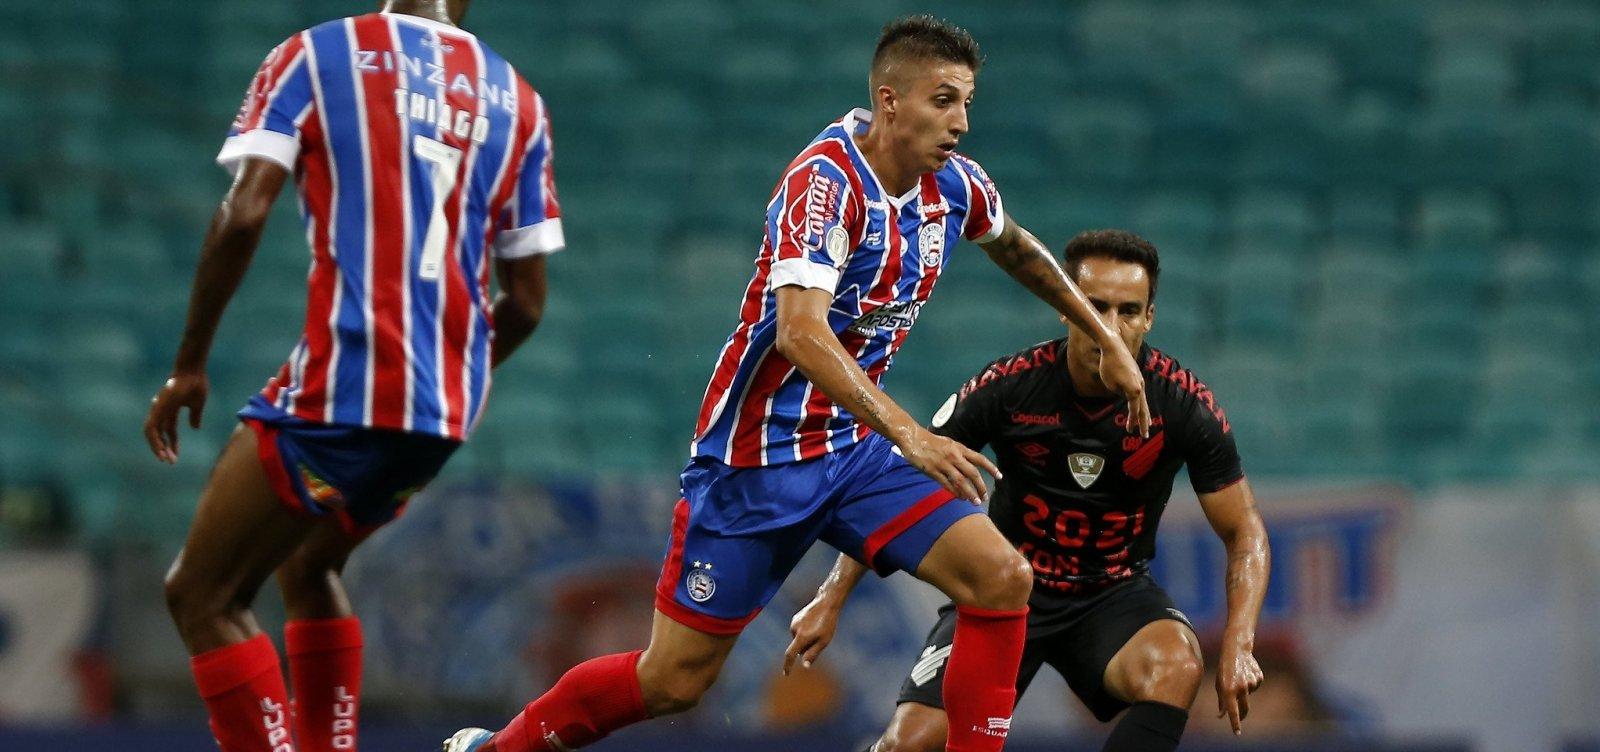 Bahia vence o Athletico-PR por 1 a 0 e respira na luta contra o rebaixamento